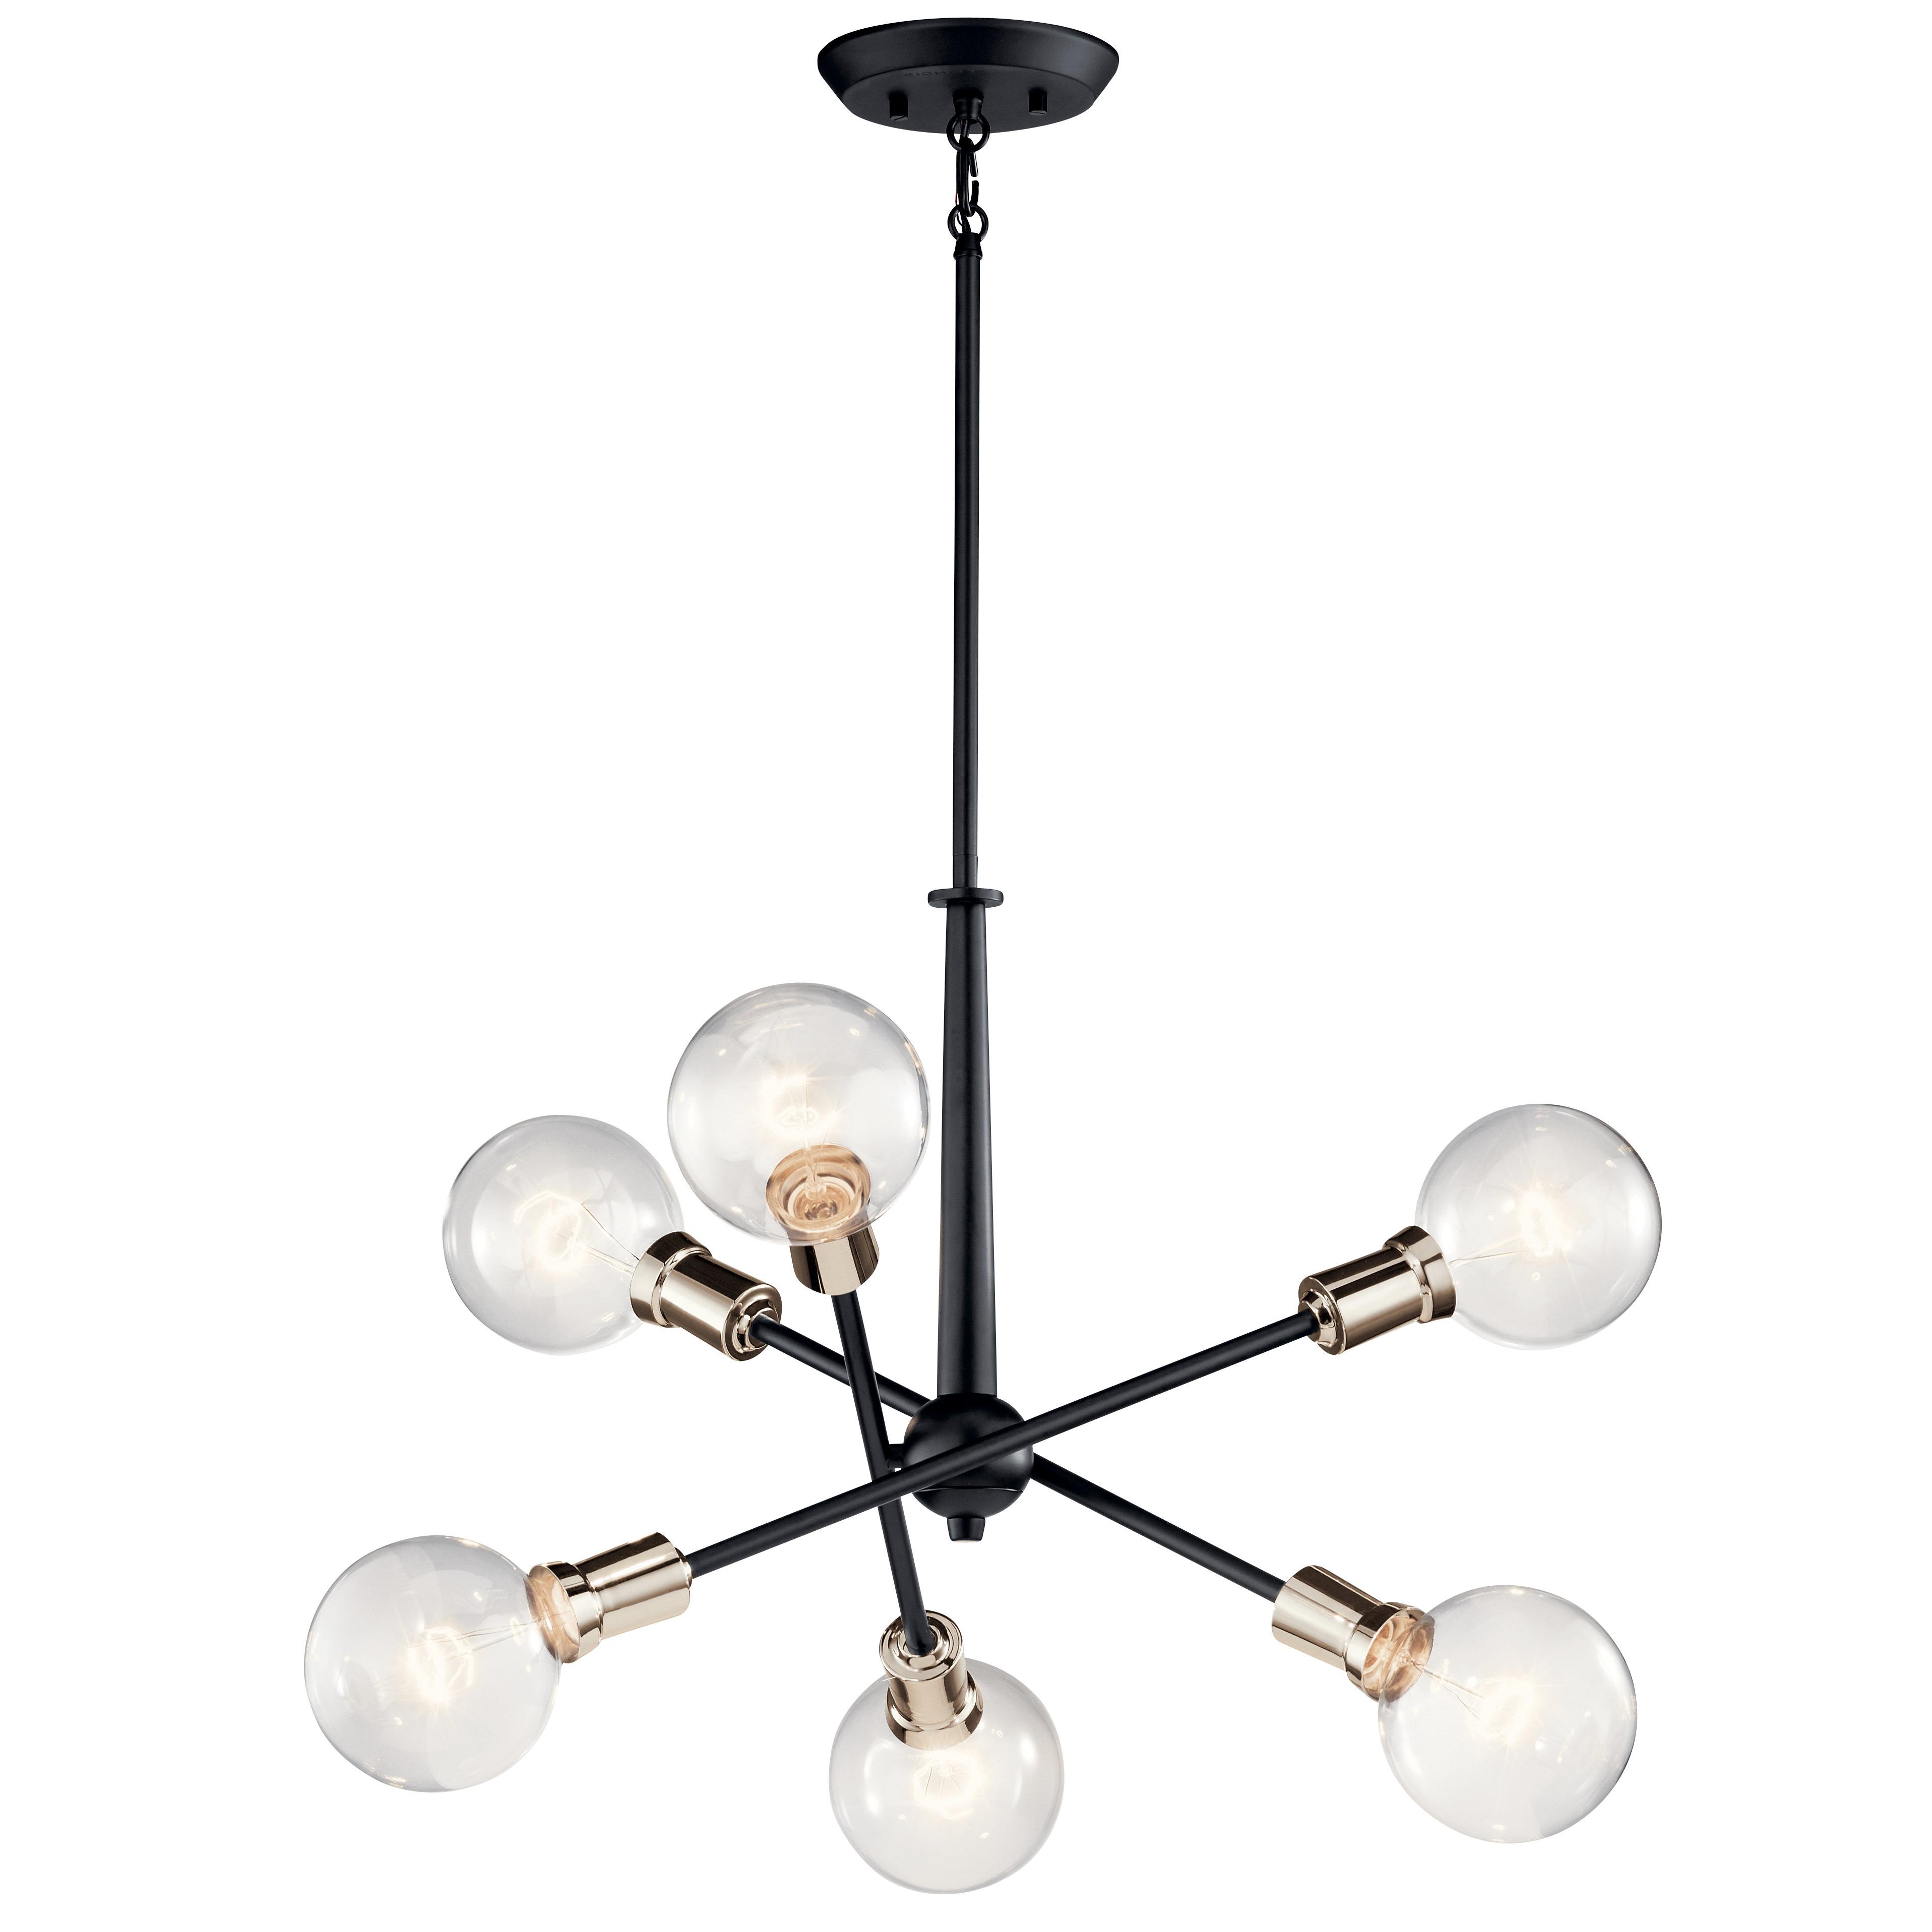 Favorite Eladia 6 Light Sputnik Chandeliers Inside Lalonde 6 Light Sputnik Chandelier (Gallery 5 of 20)